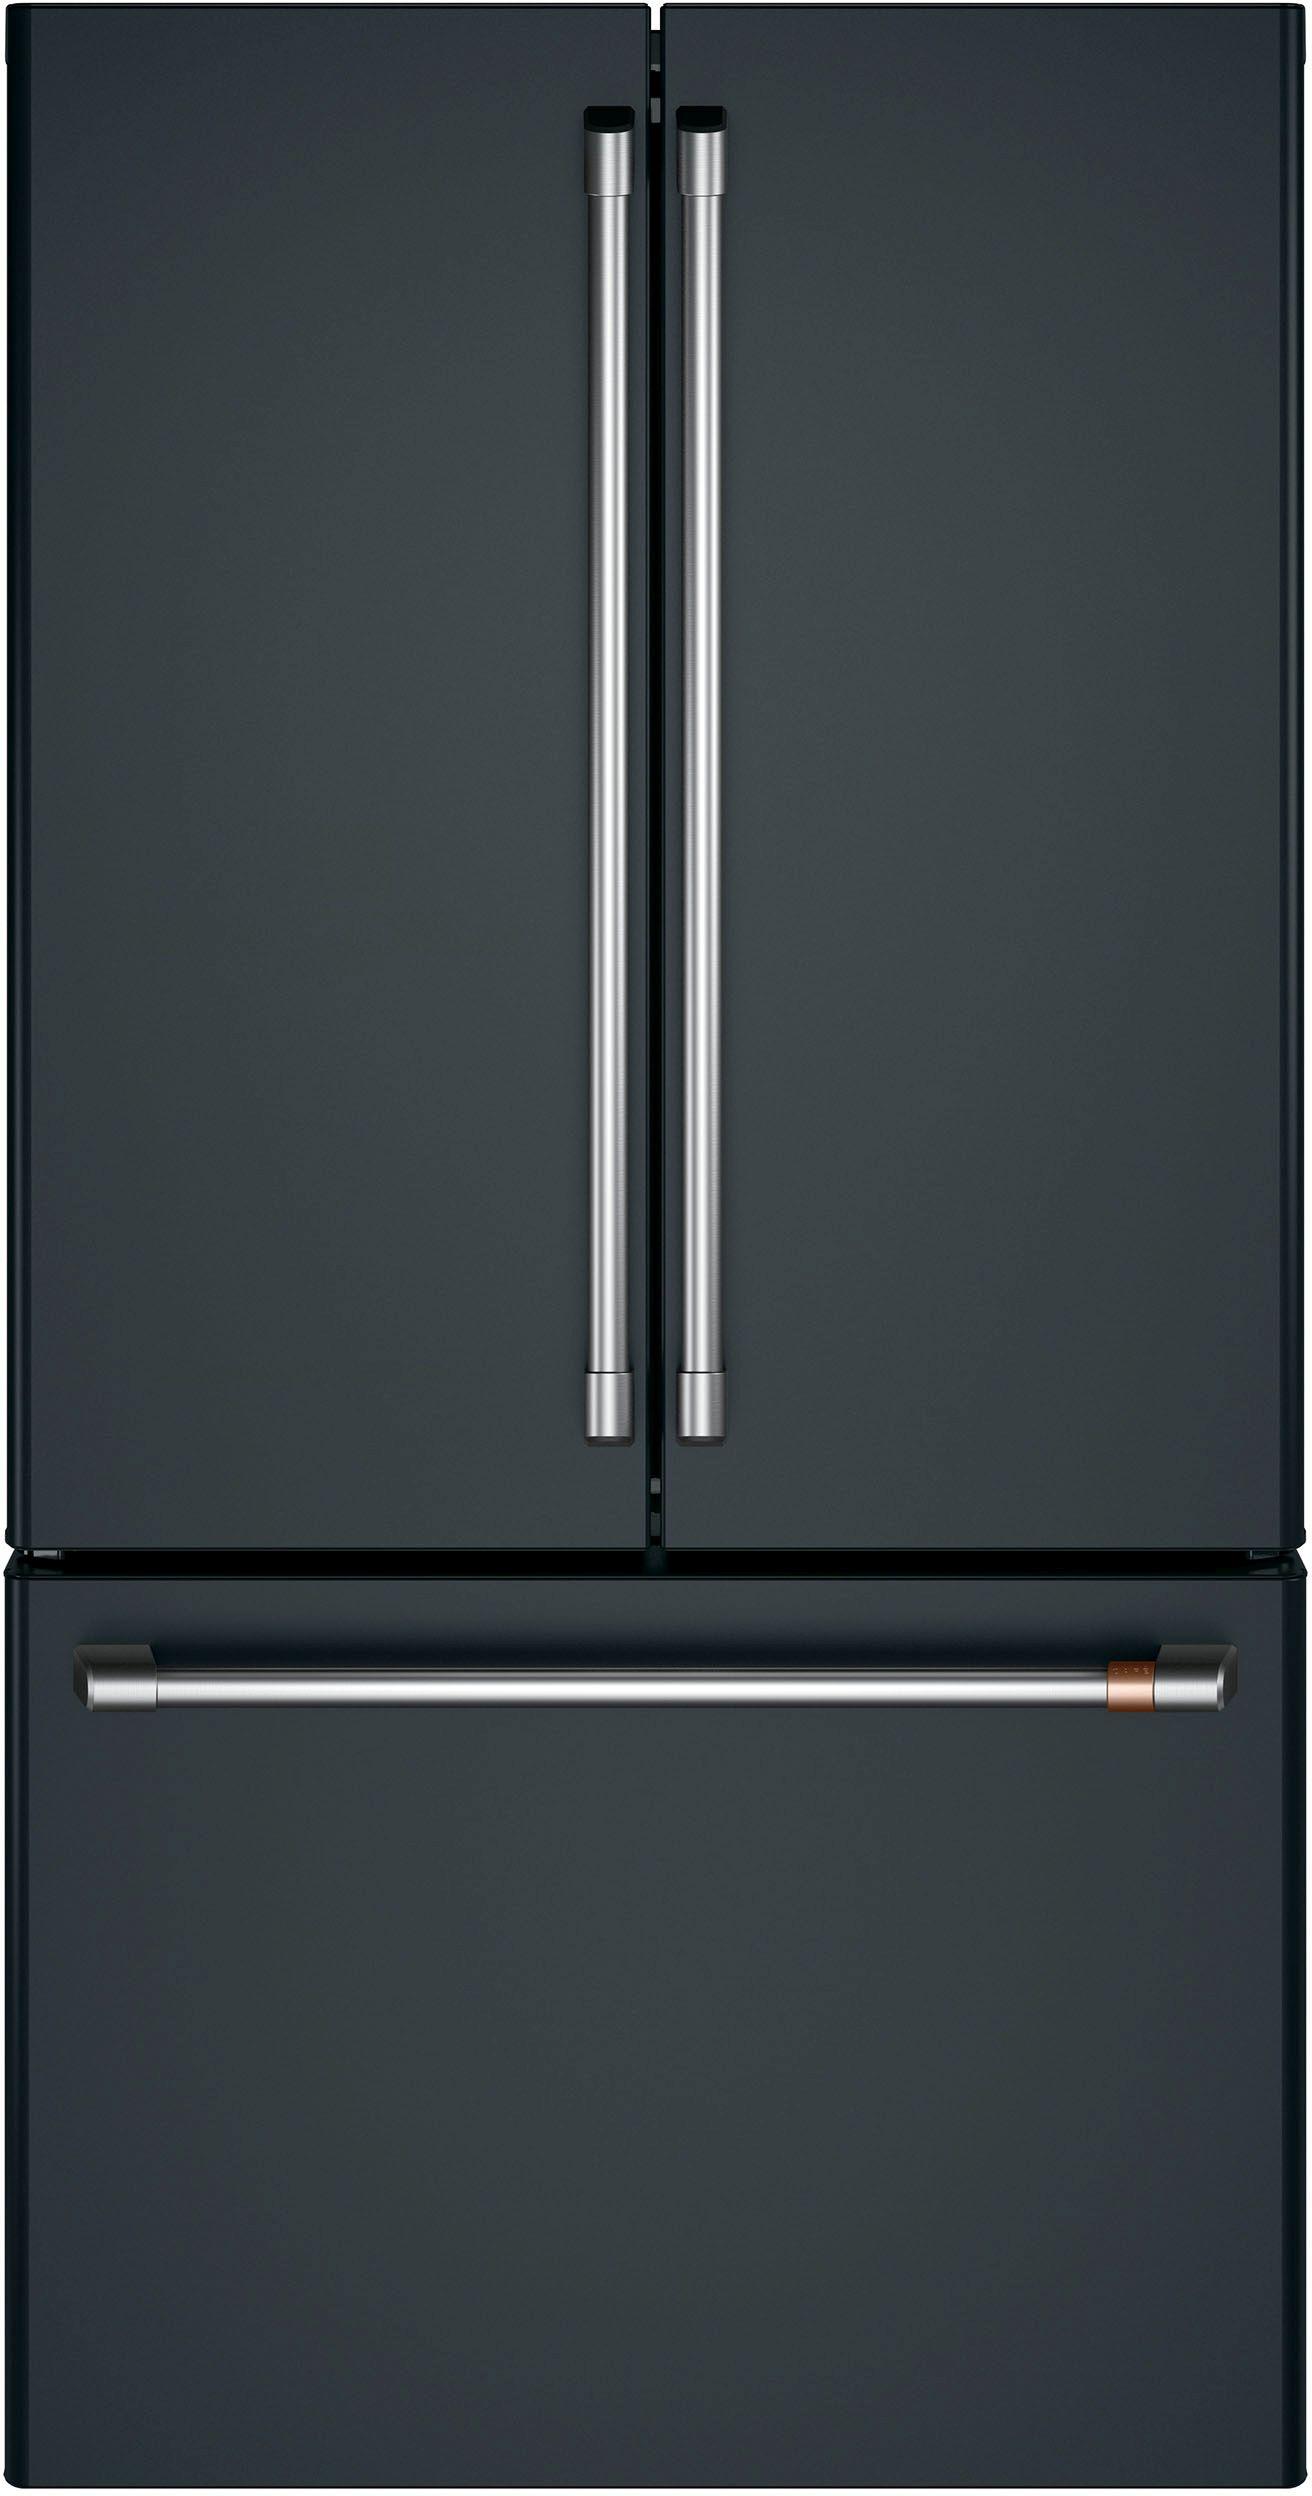 Caf 231 Cu Ft Counter Depth French Door Refrigerator Matte